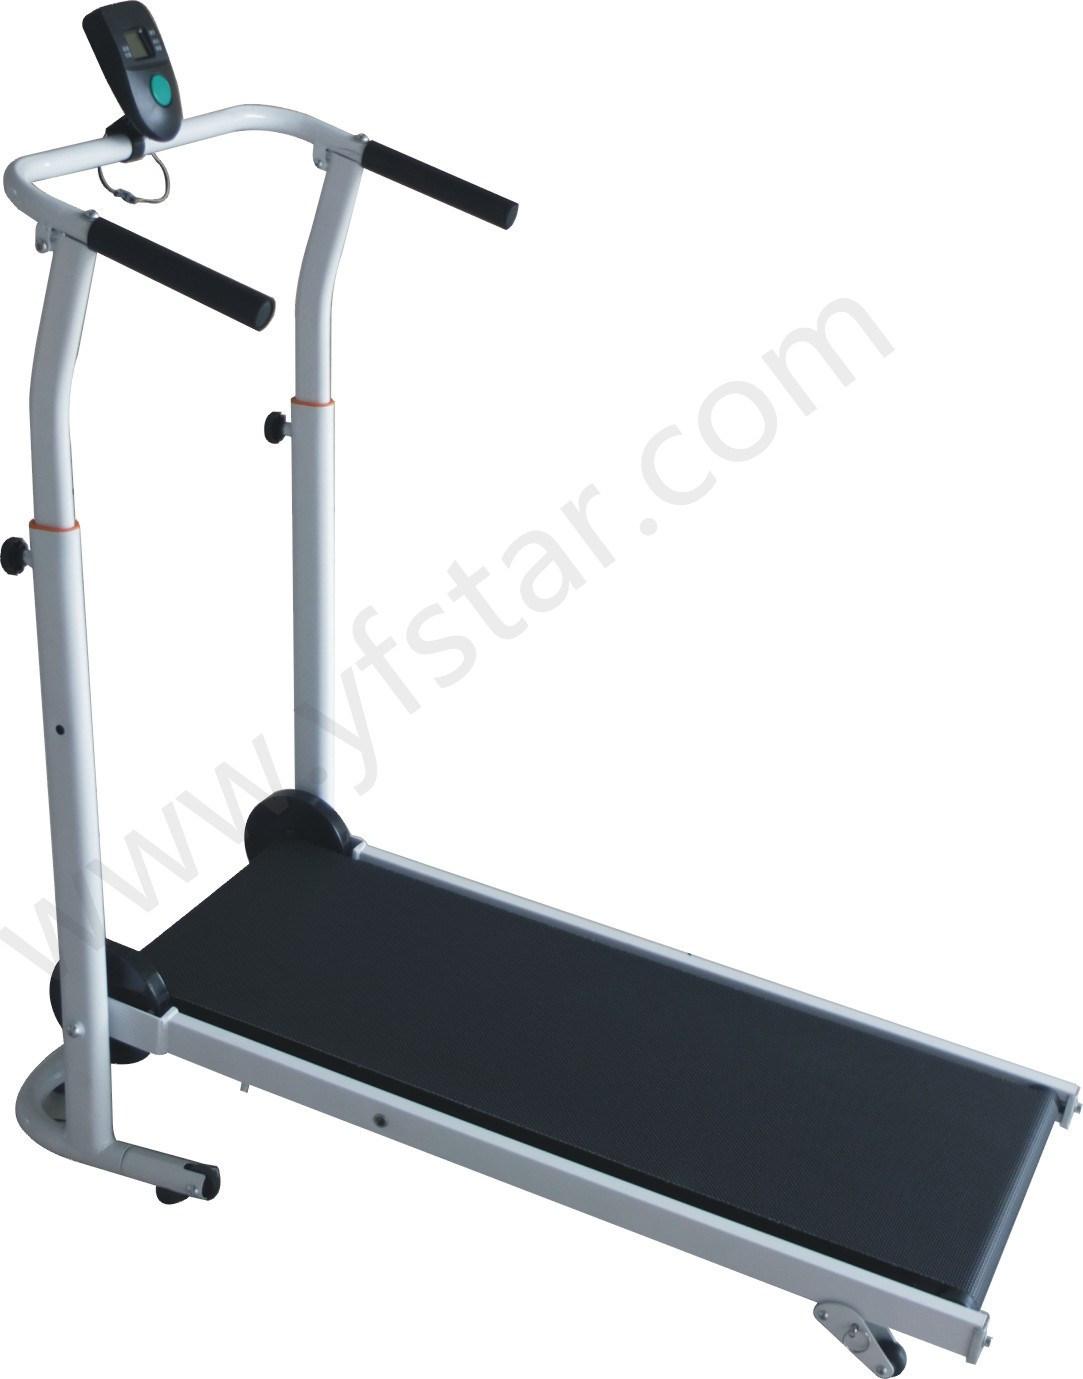 Home Design Fitness Exerciser Manual Treadmill, T-100